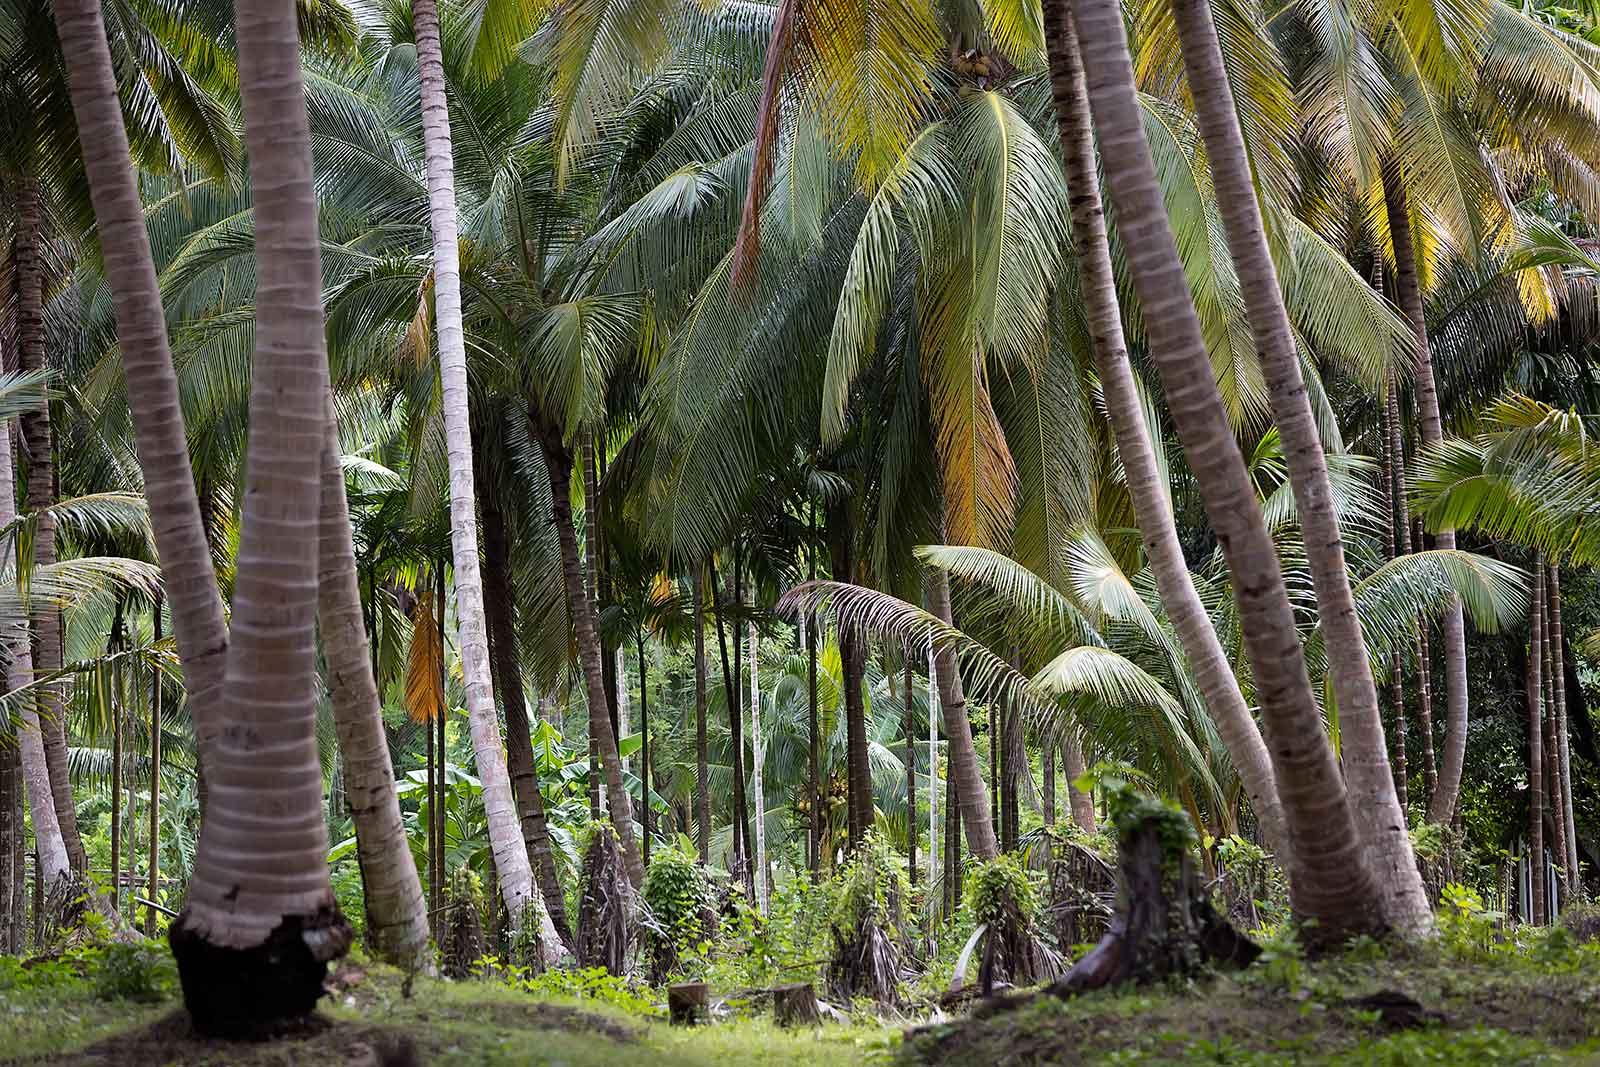 havelock-andaman-islands-palm-trees-india